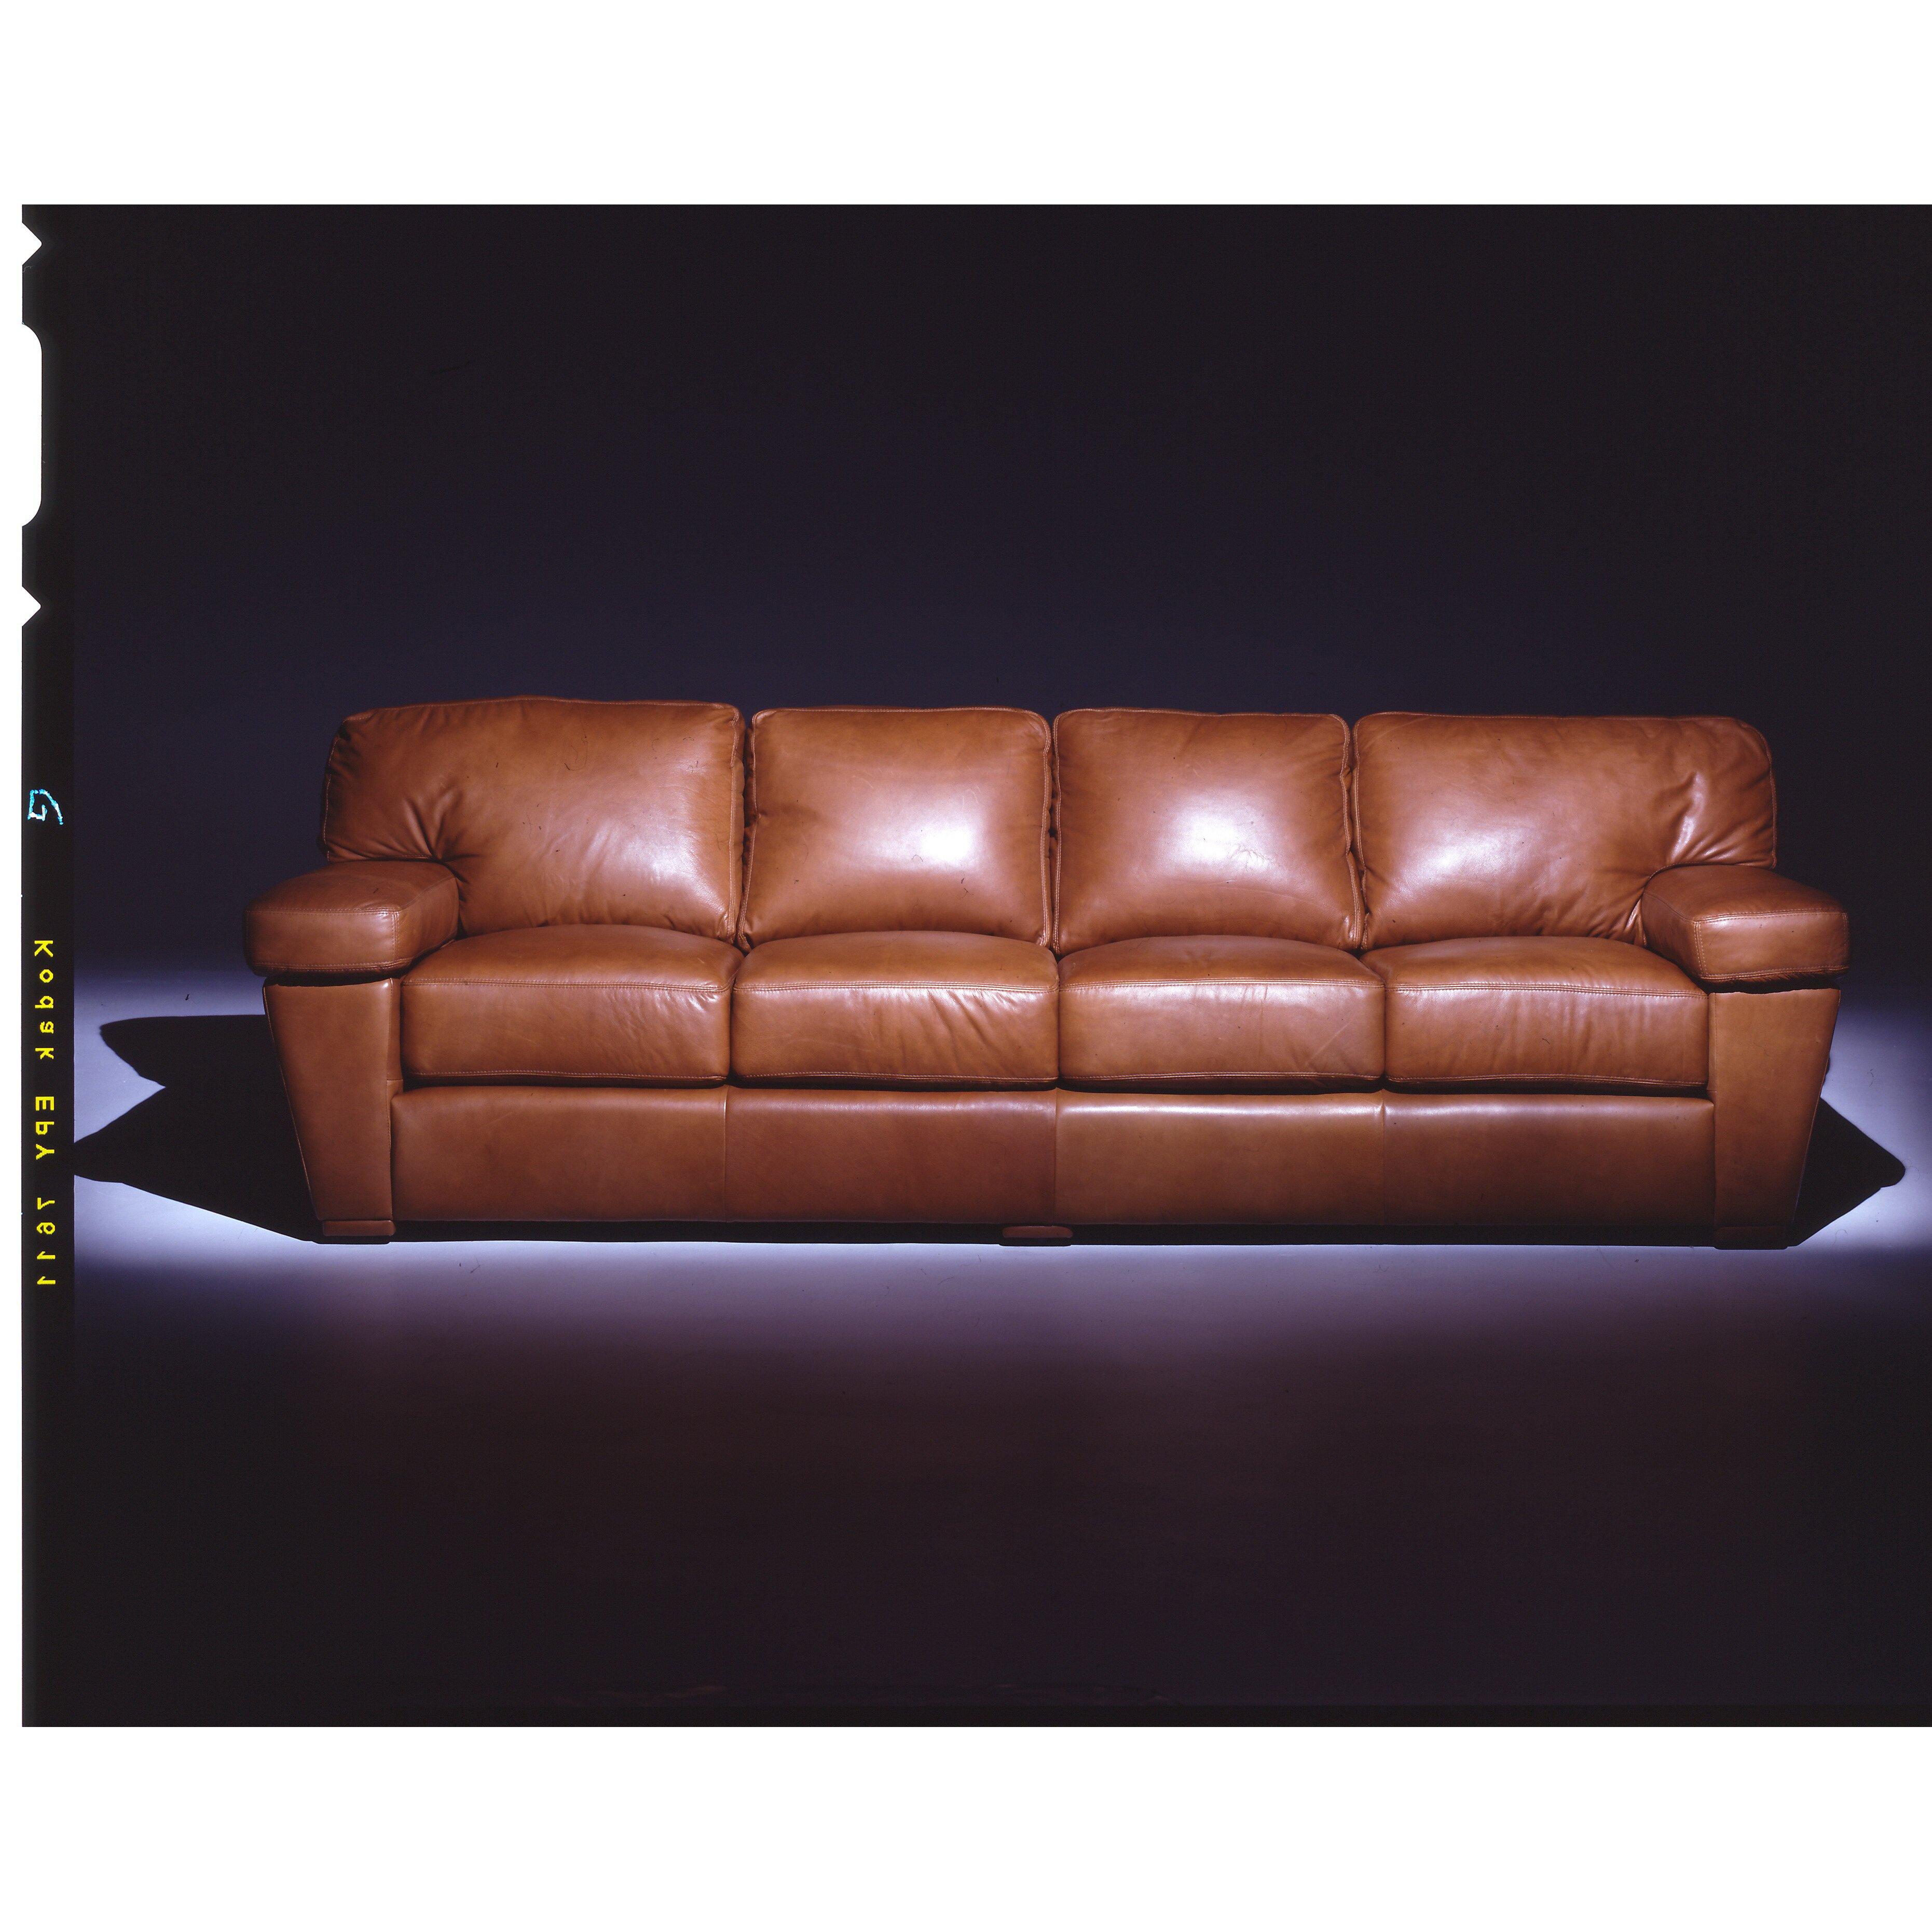 Omnia Leather Prescott 4 Seat Sofa Leather Living Room Set Reviews Wayfair